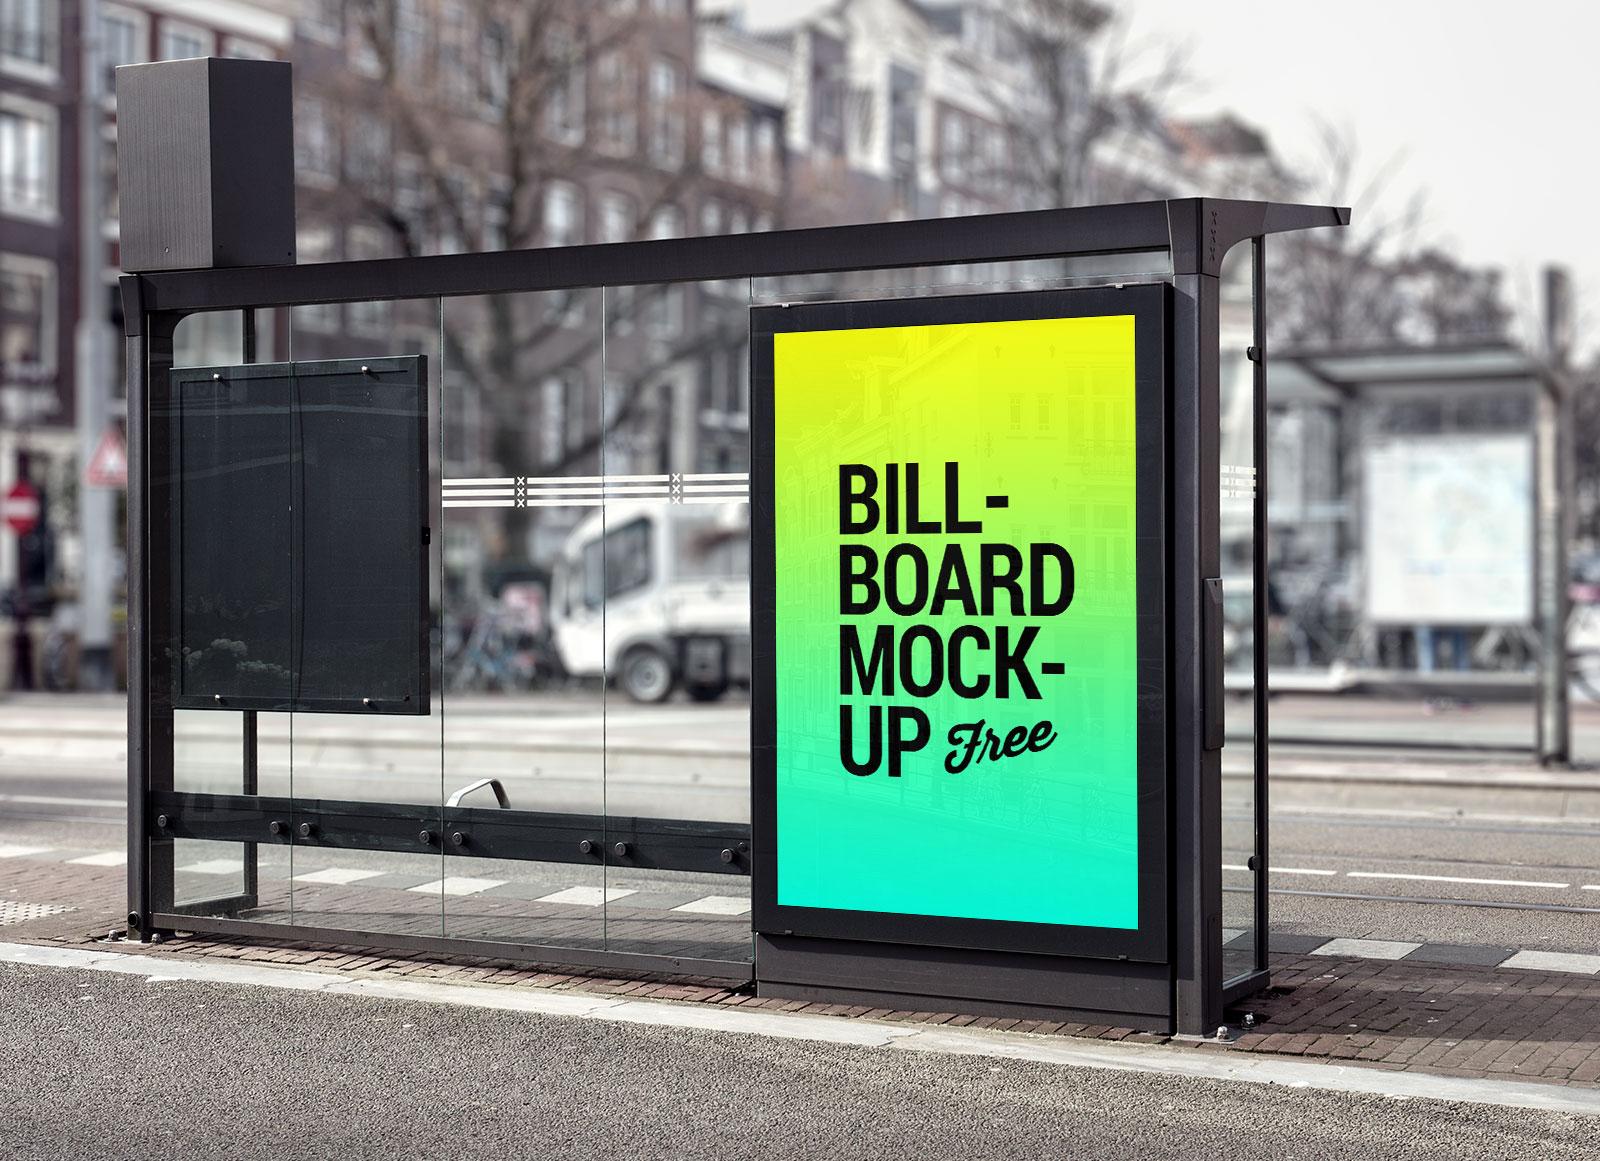 Free Bus Shelter Roadside Billboard Mockup PSD File